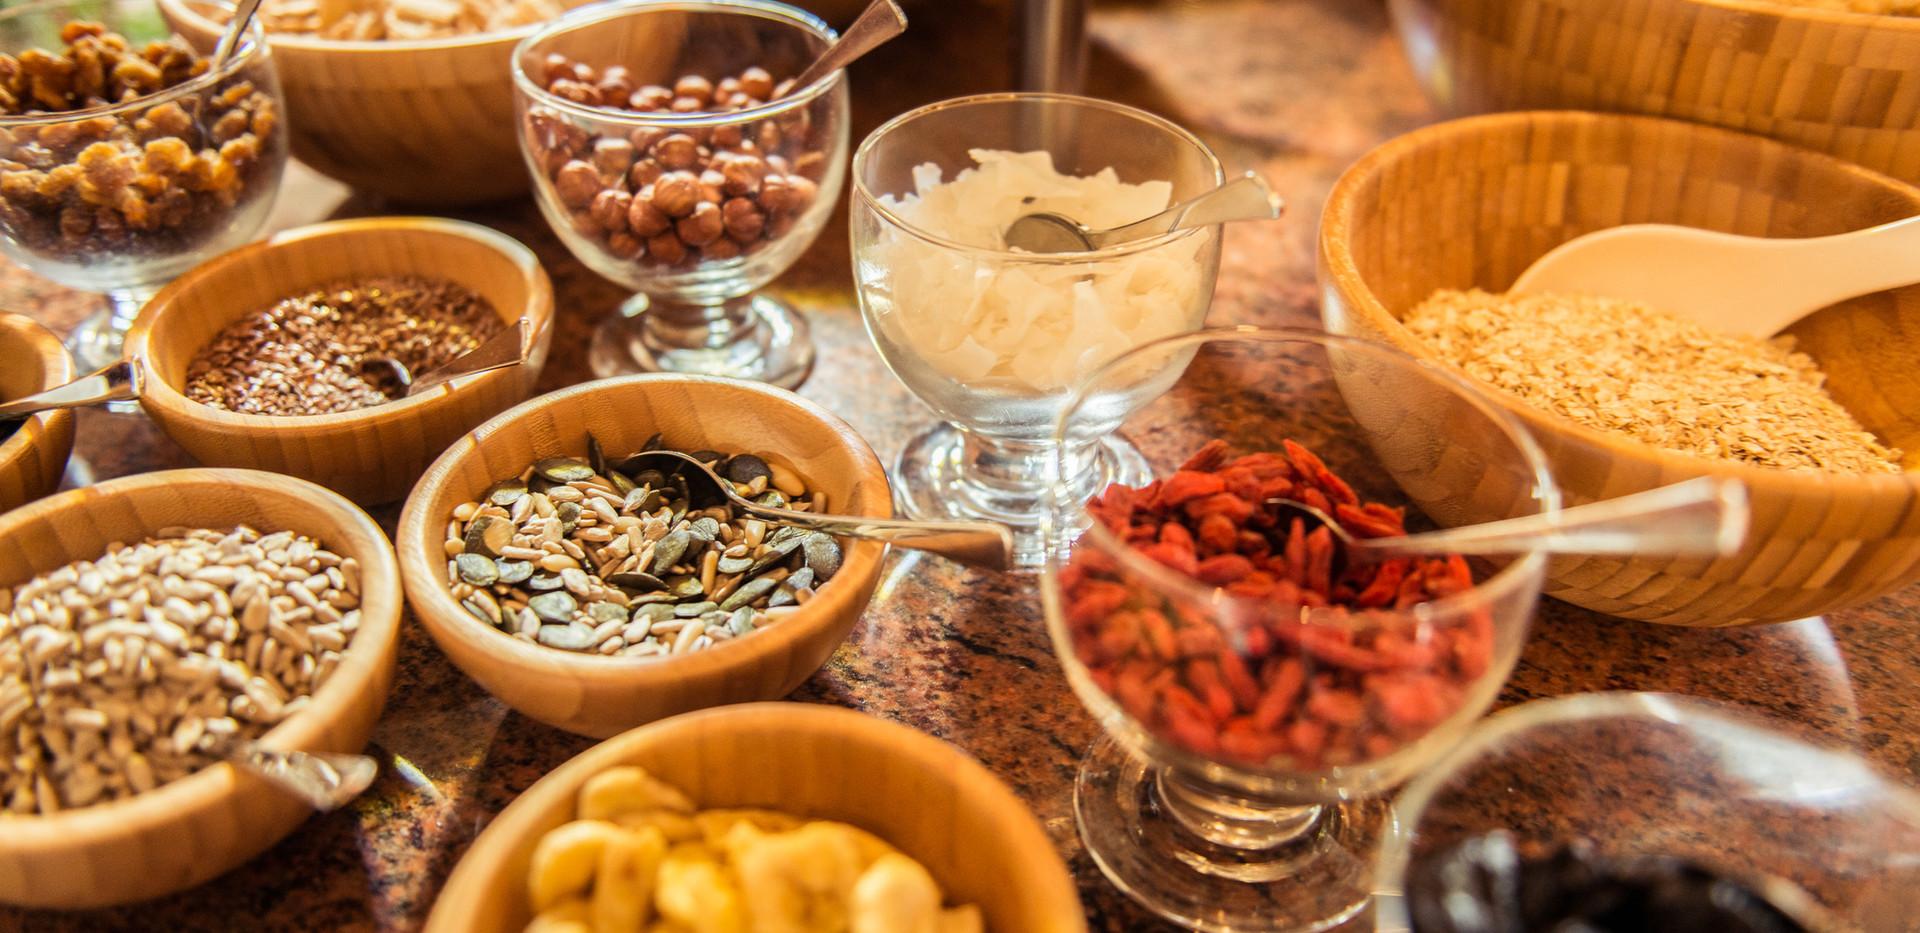 Müsli und Granola Frühstücks-Manufaktur